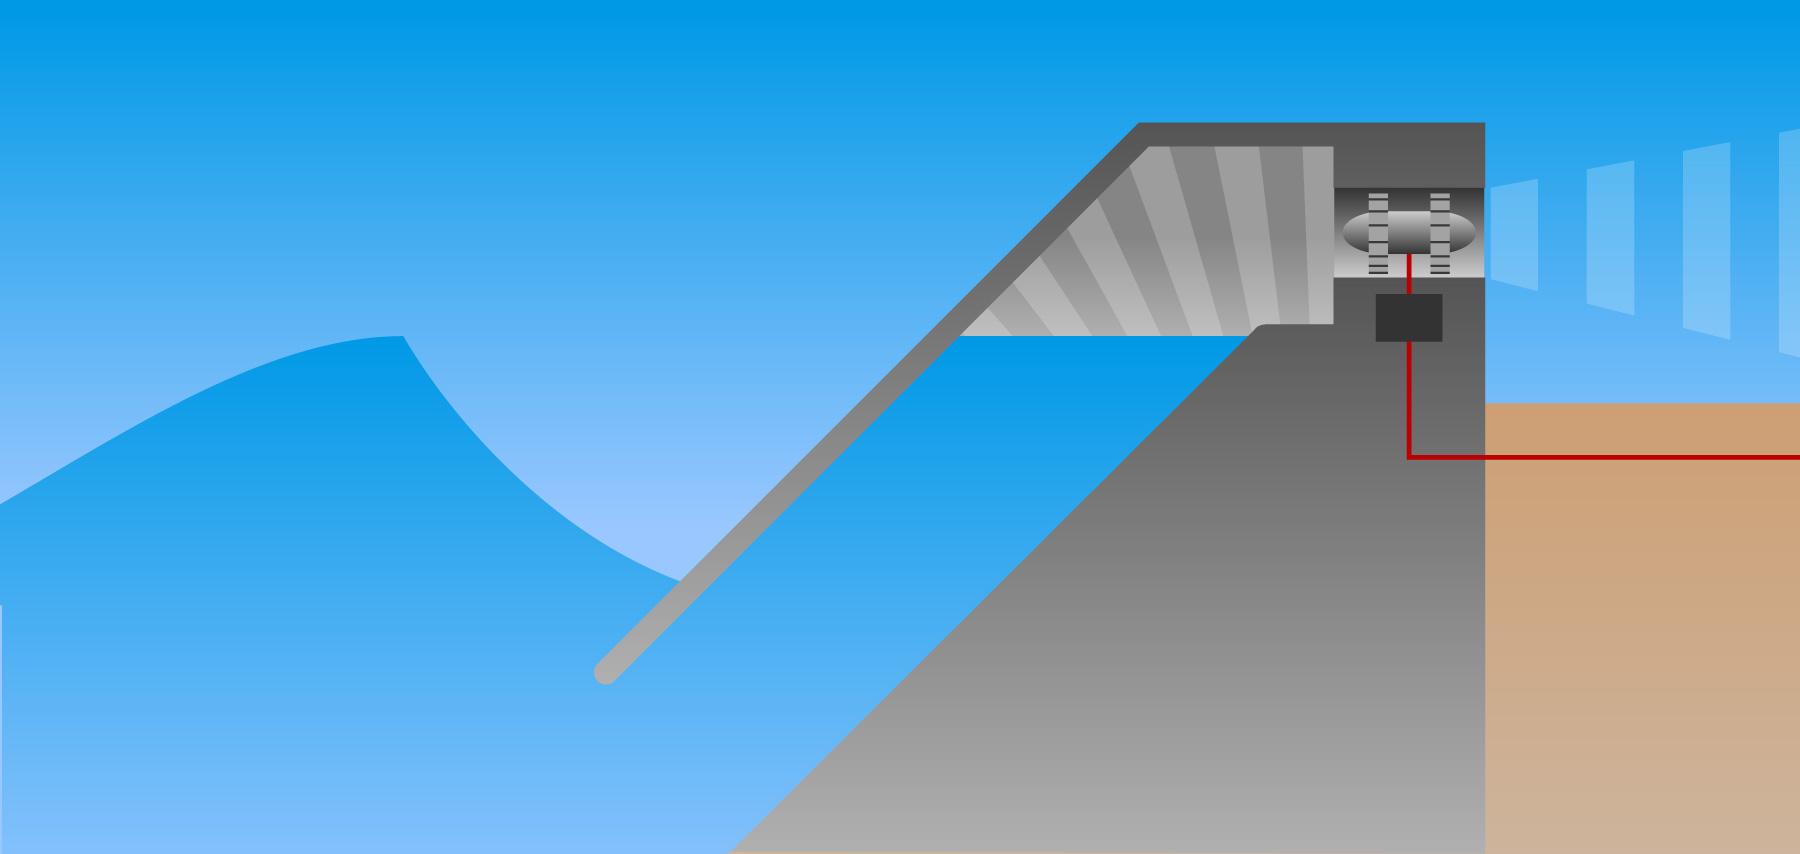 wave_generator_2.0